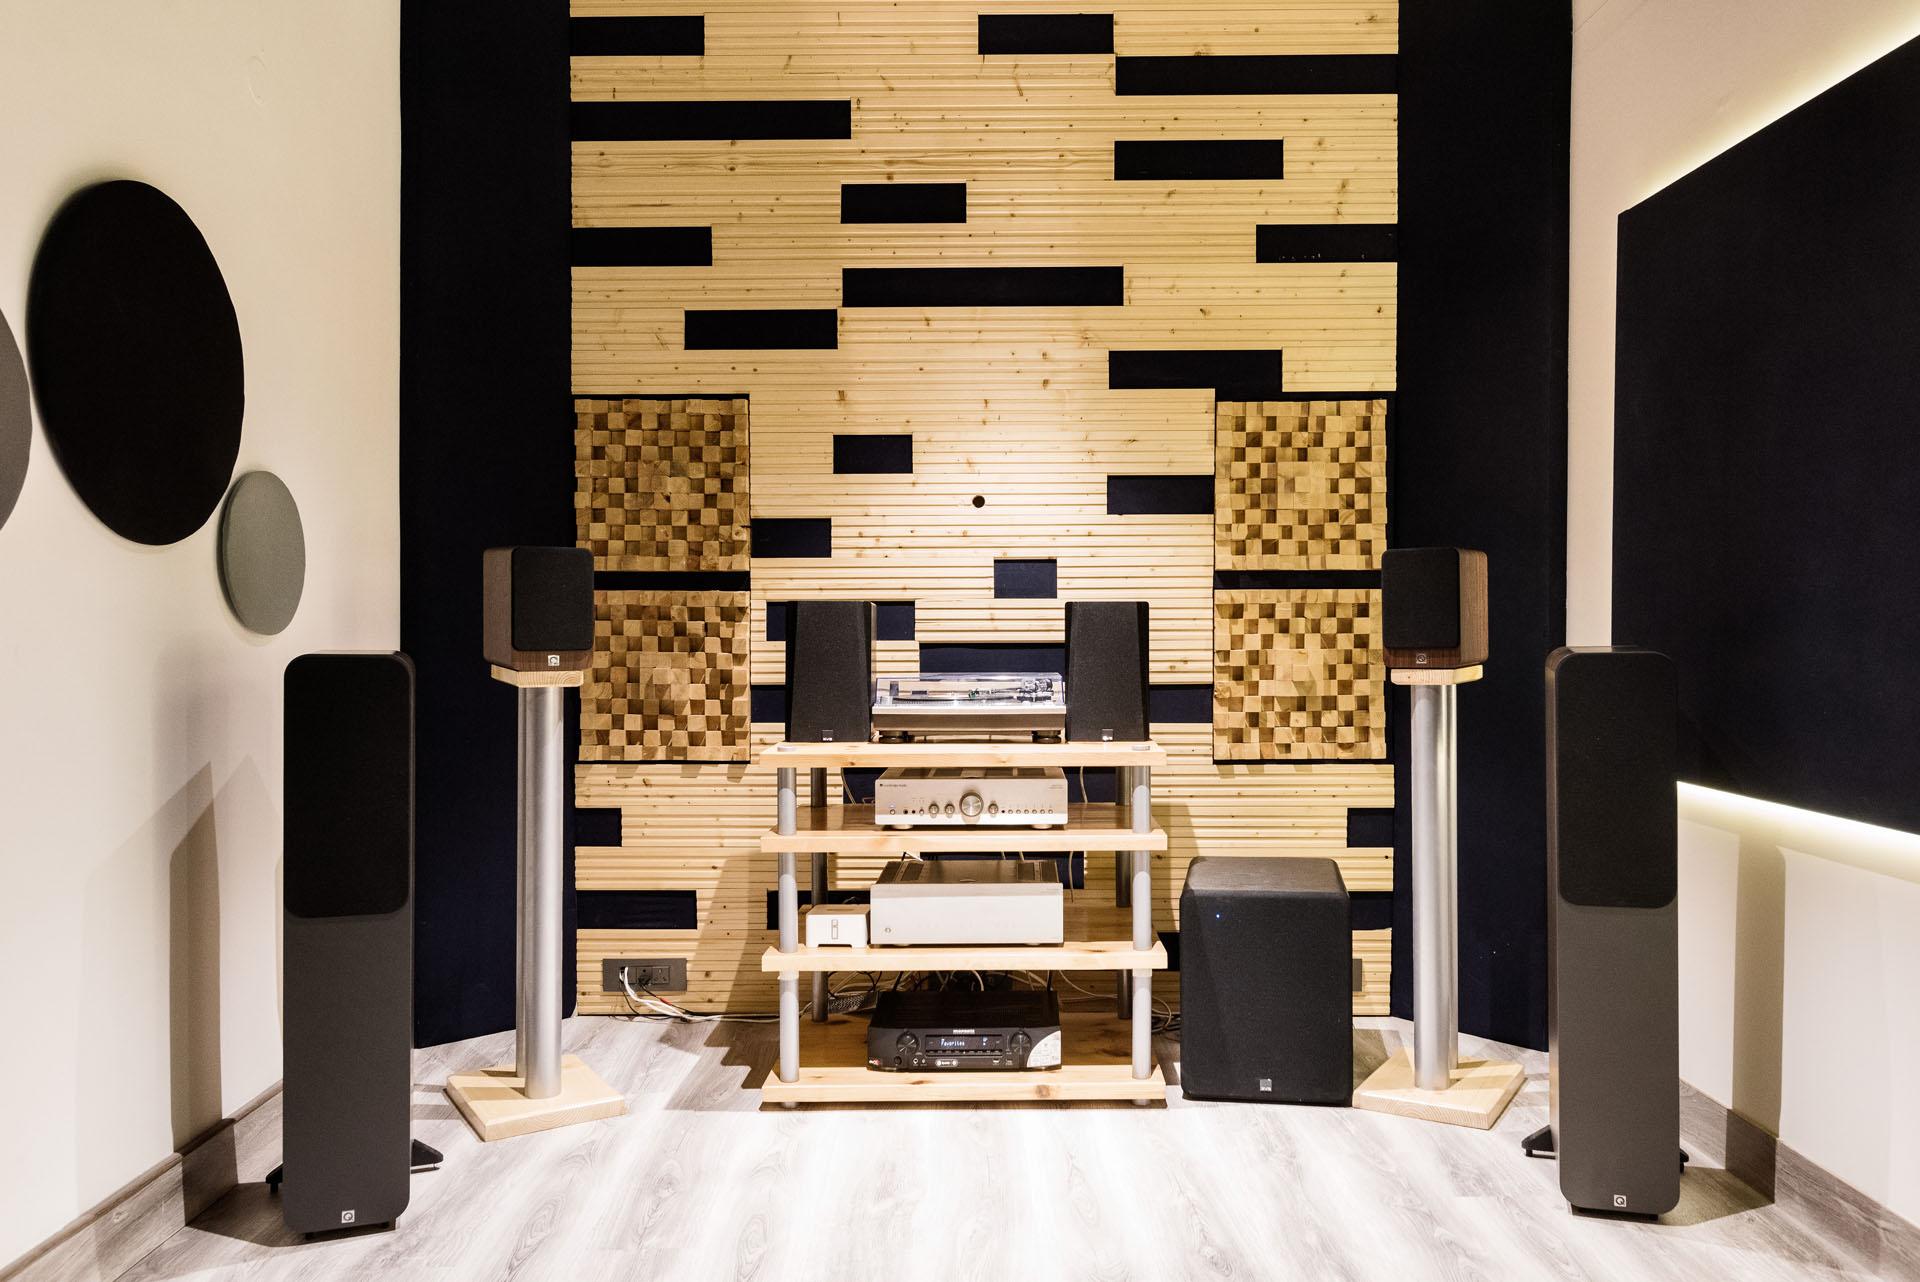 Stereo - Music Listening Room